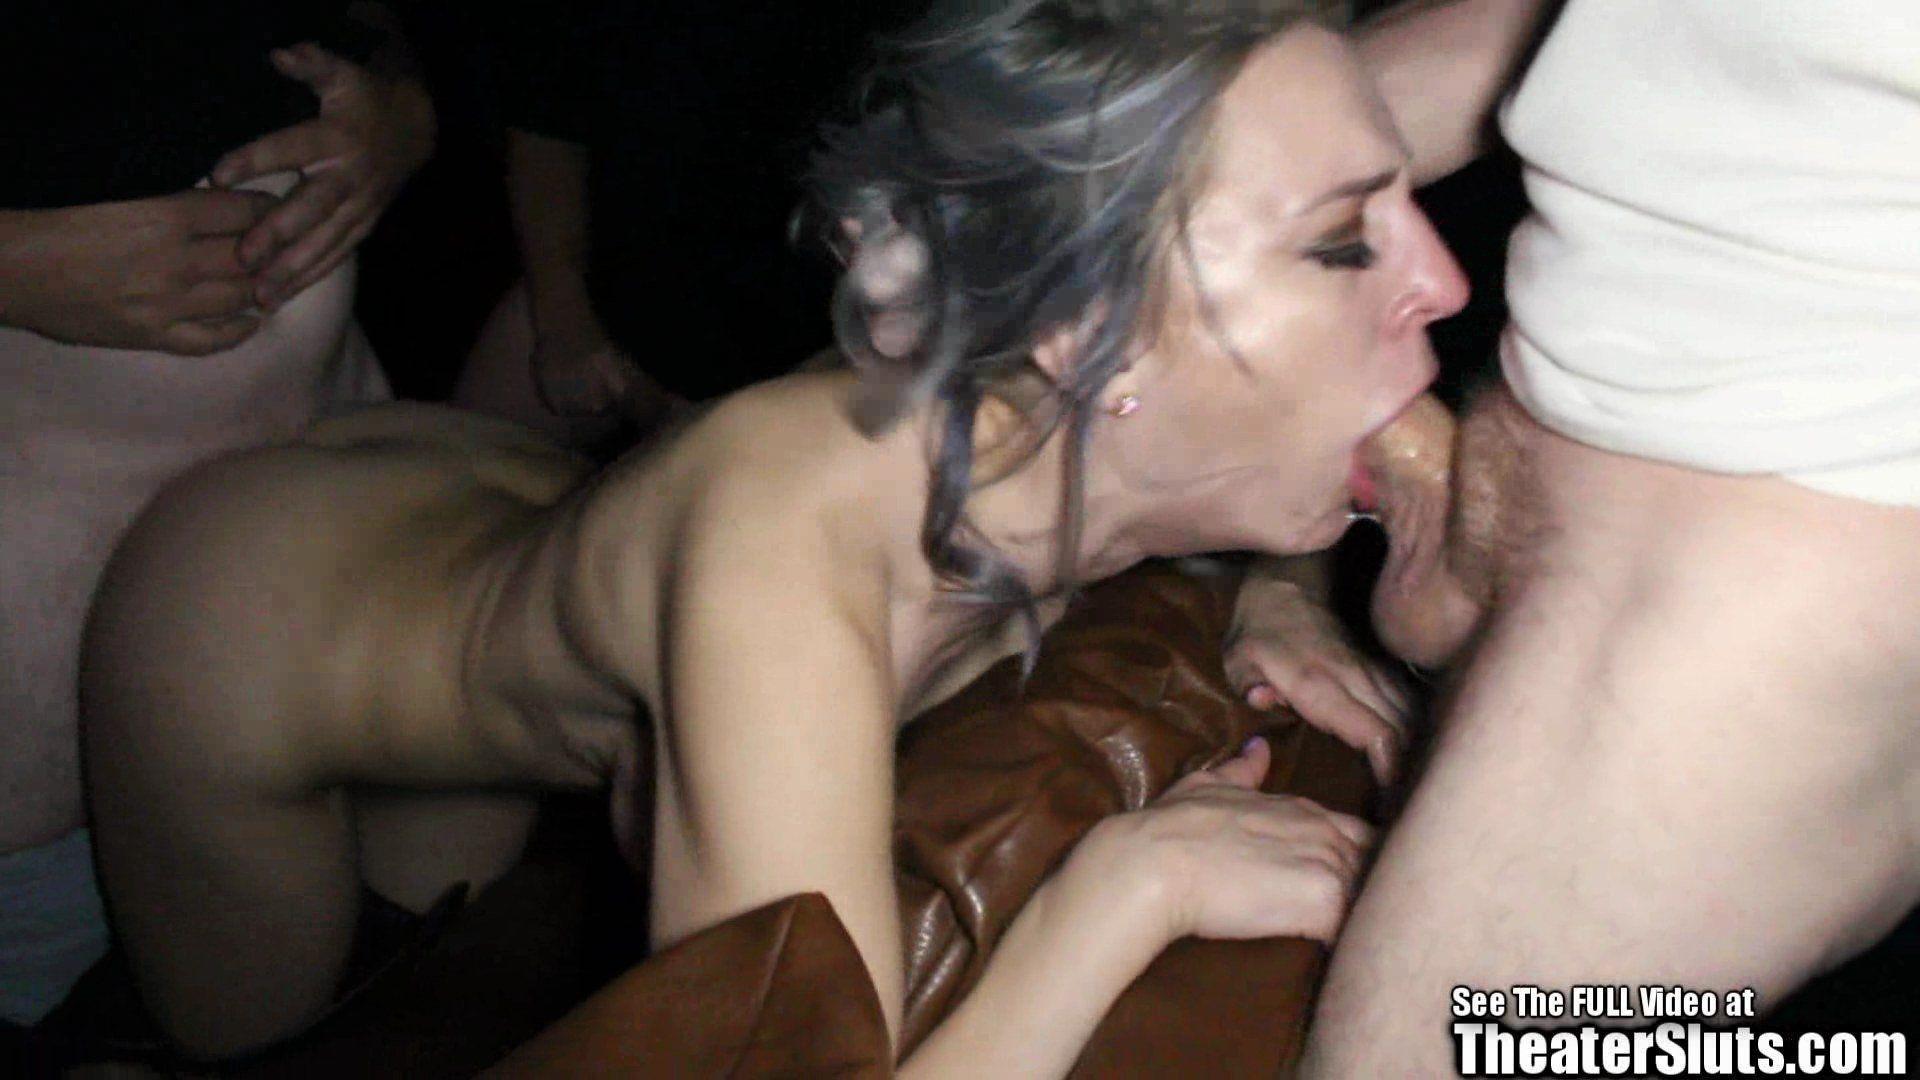 Horny lesbian action